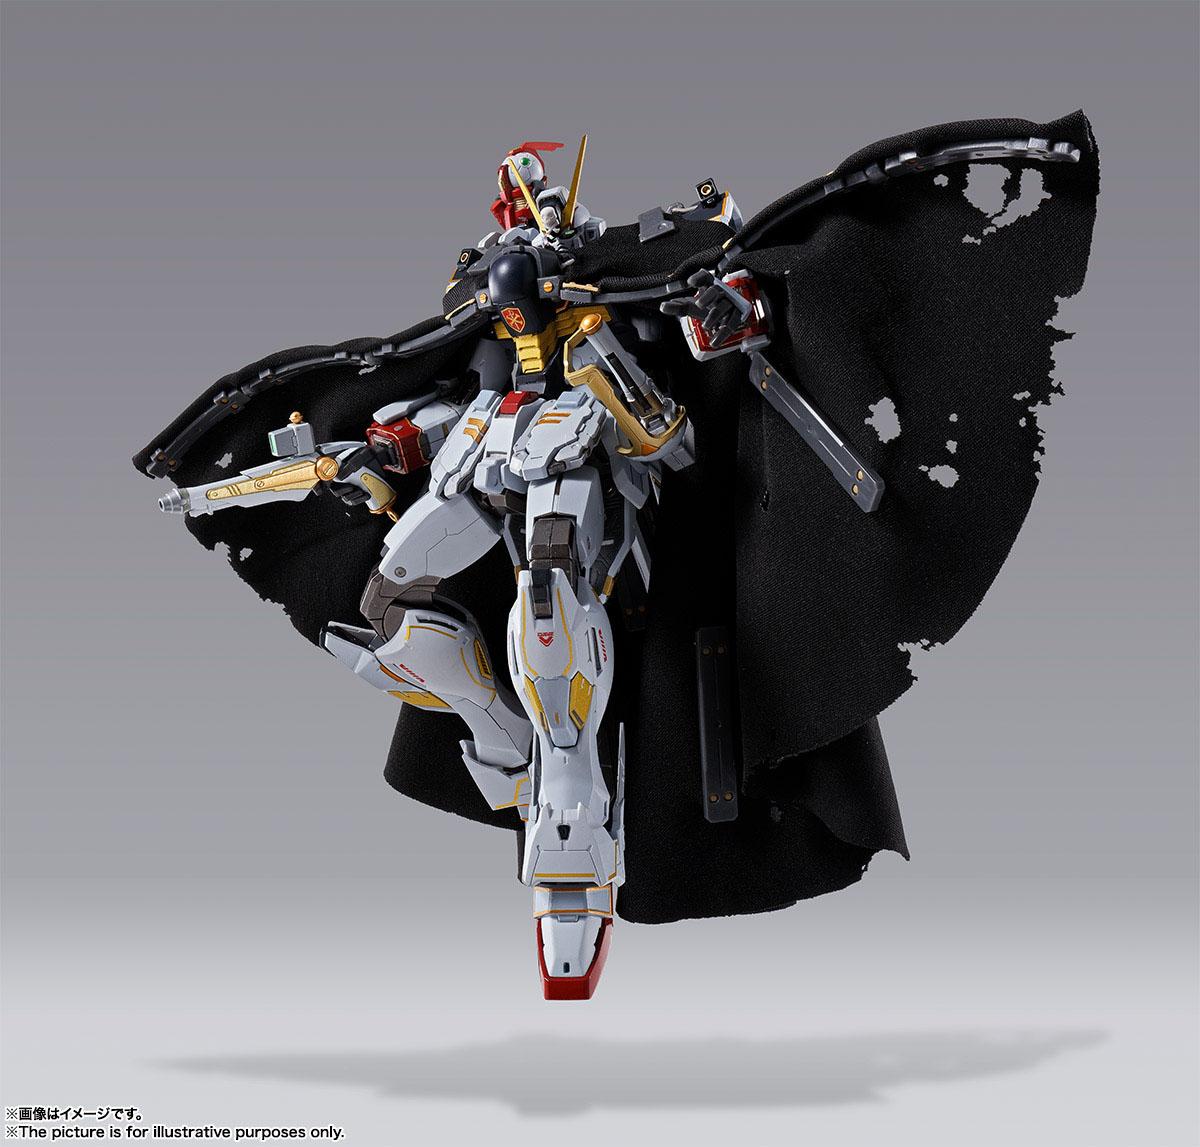 METAL BUILD『クロスボーン・ガンダムX1』機動戦士クロスボーン・ガンダム 可動フィギュア-001